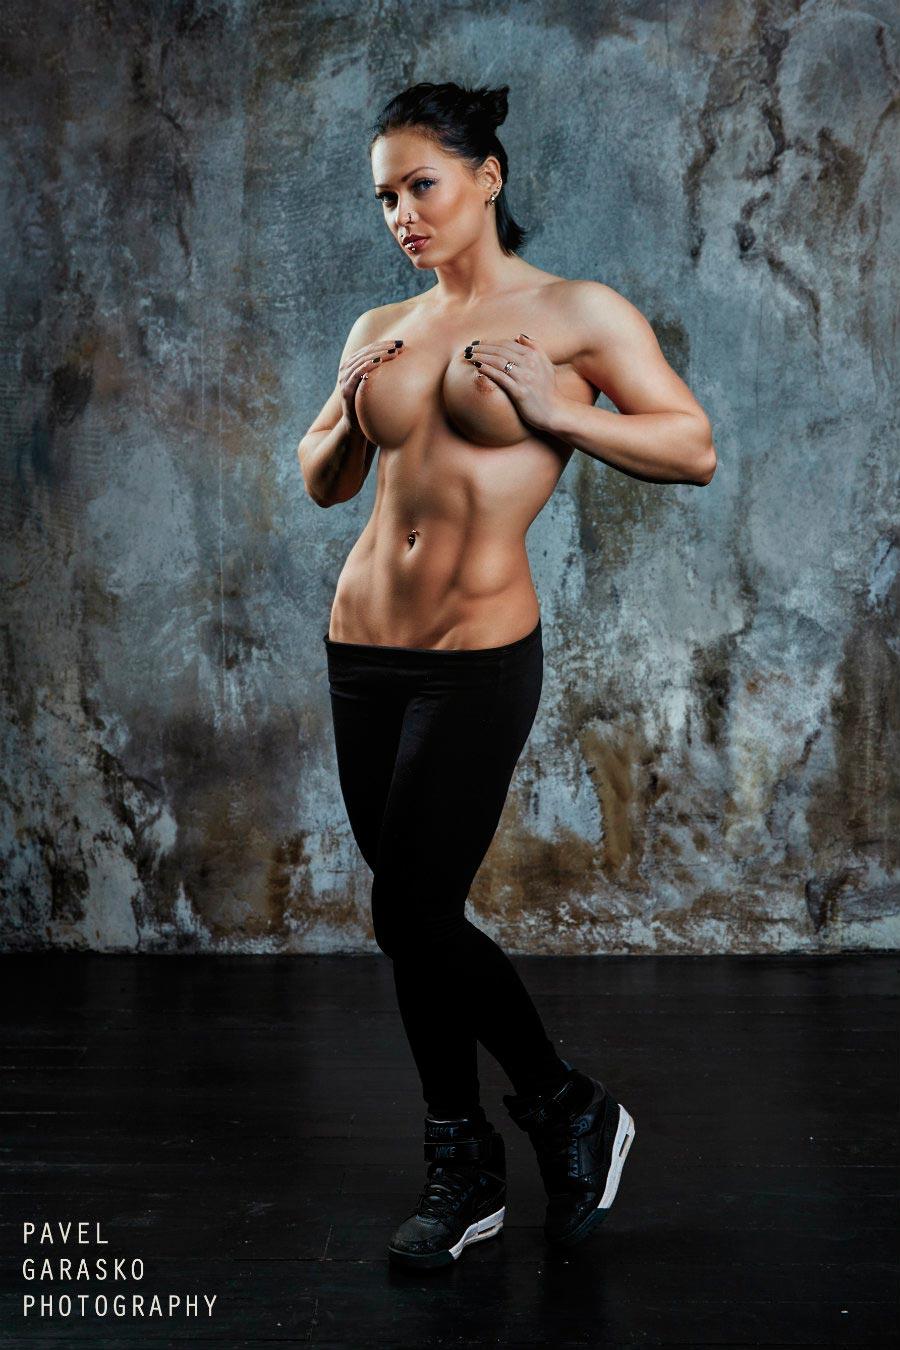 Pavel Garasko Павел Гарасько: спортсменки-красавицы